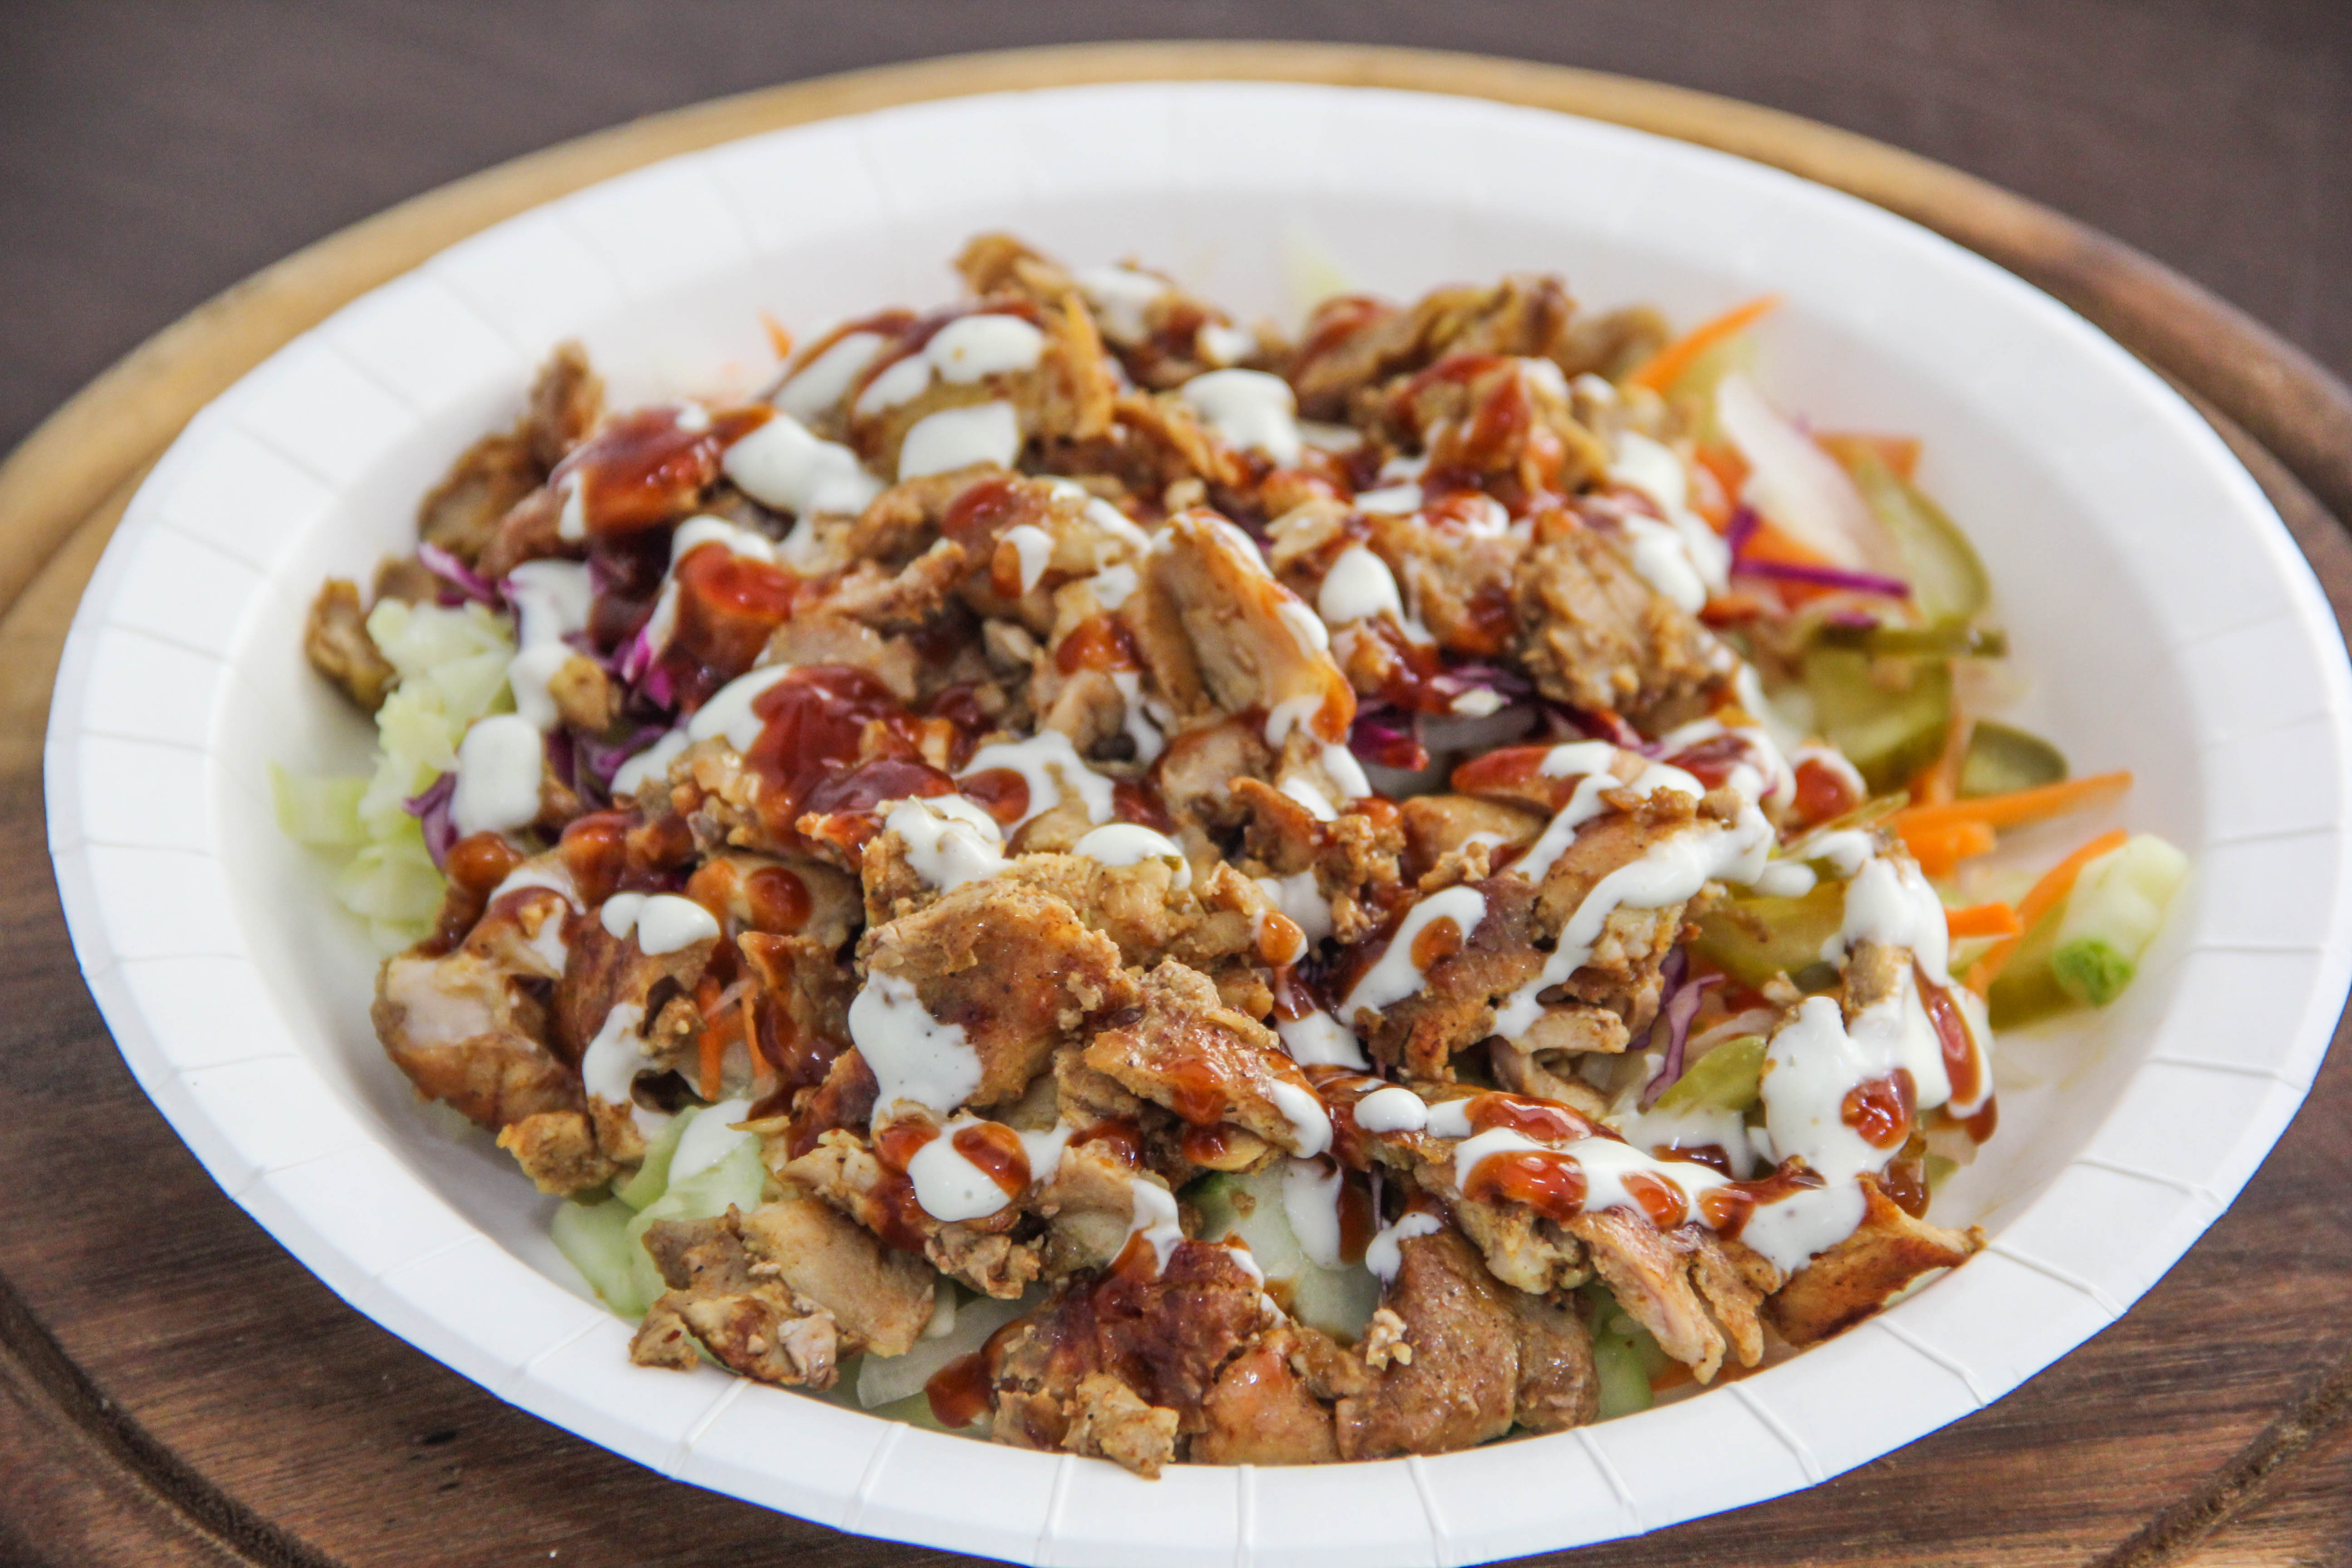 Chicken Salad with Garlic & Chili sauce